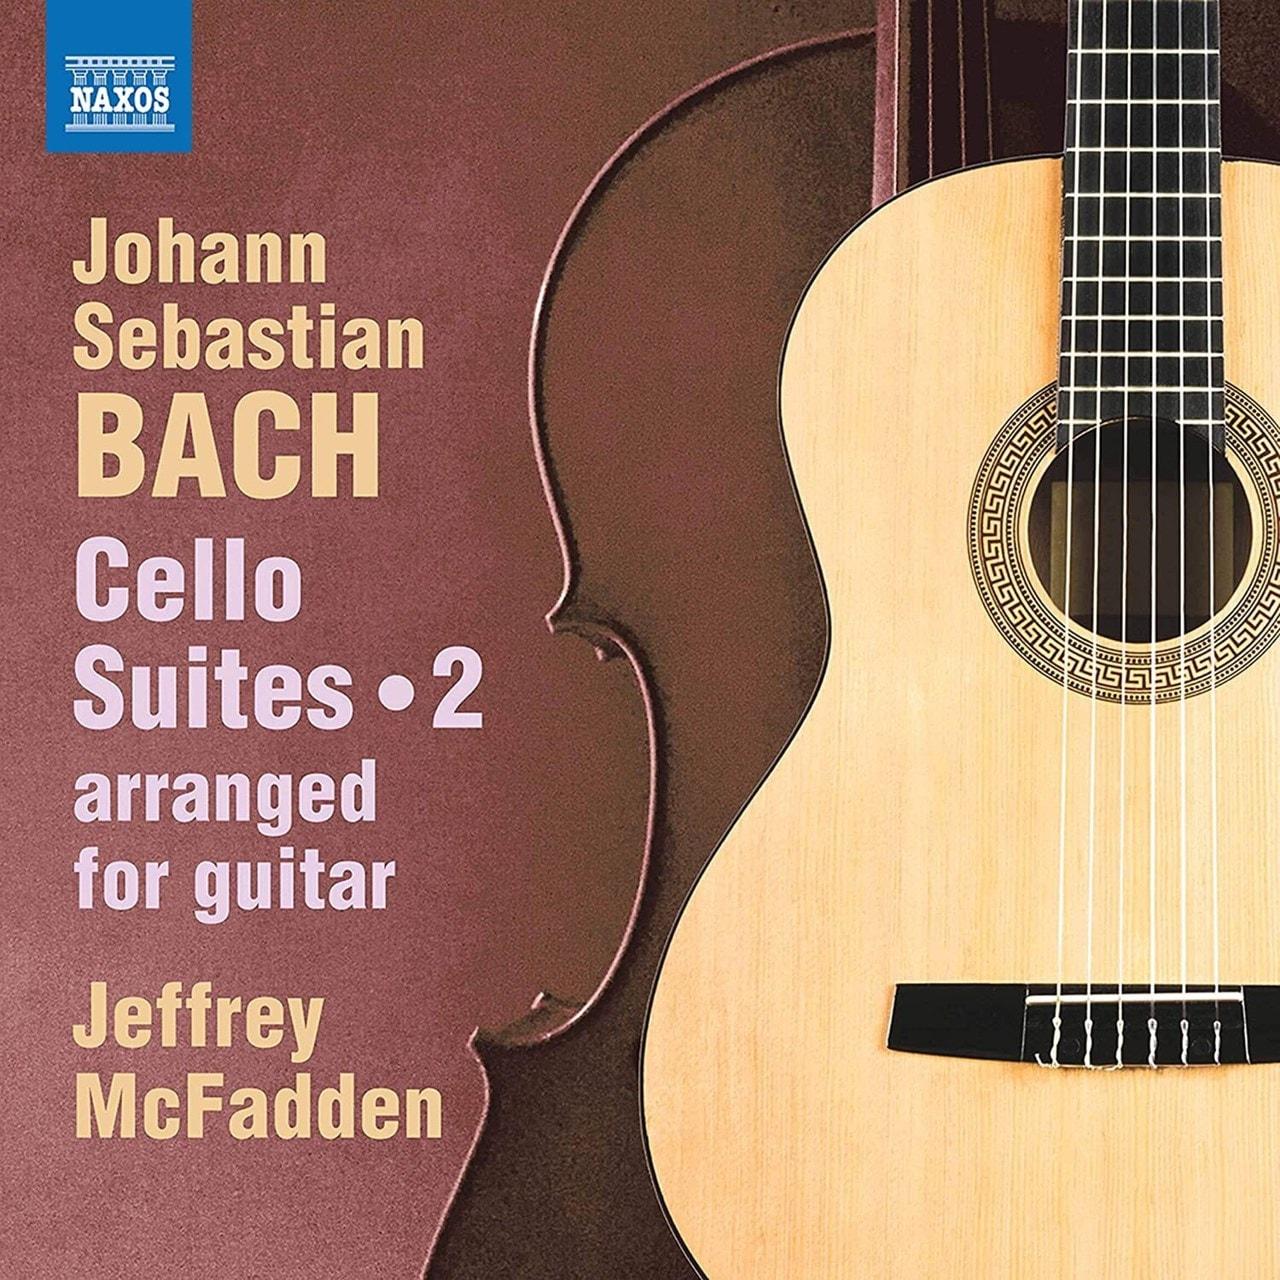 Johann Sebastain Bach: Cello Suites: Arranged for Guitar - Volume 2 - 1